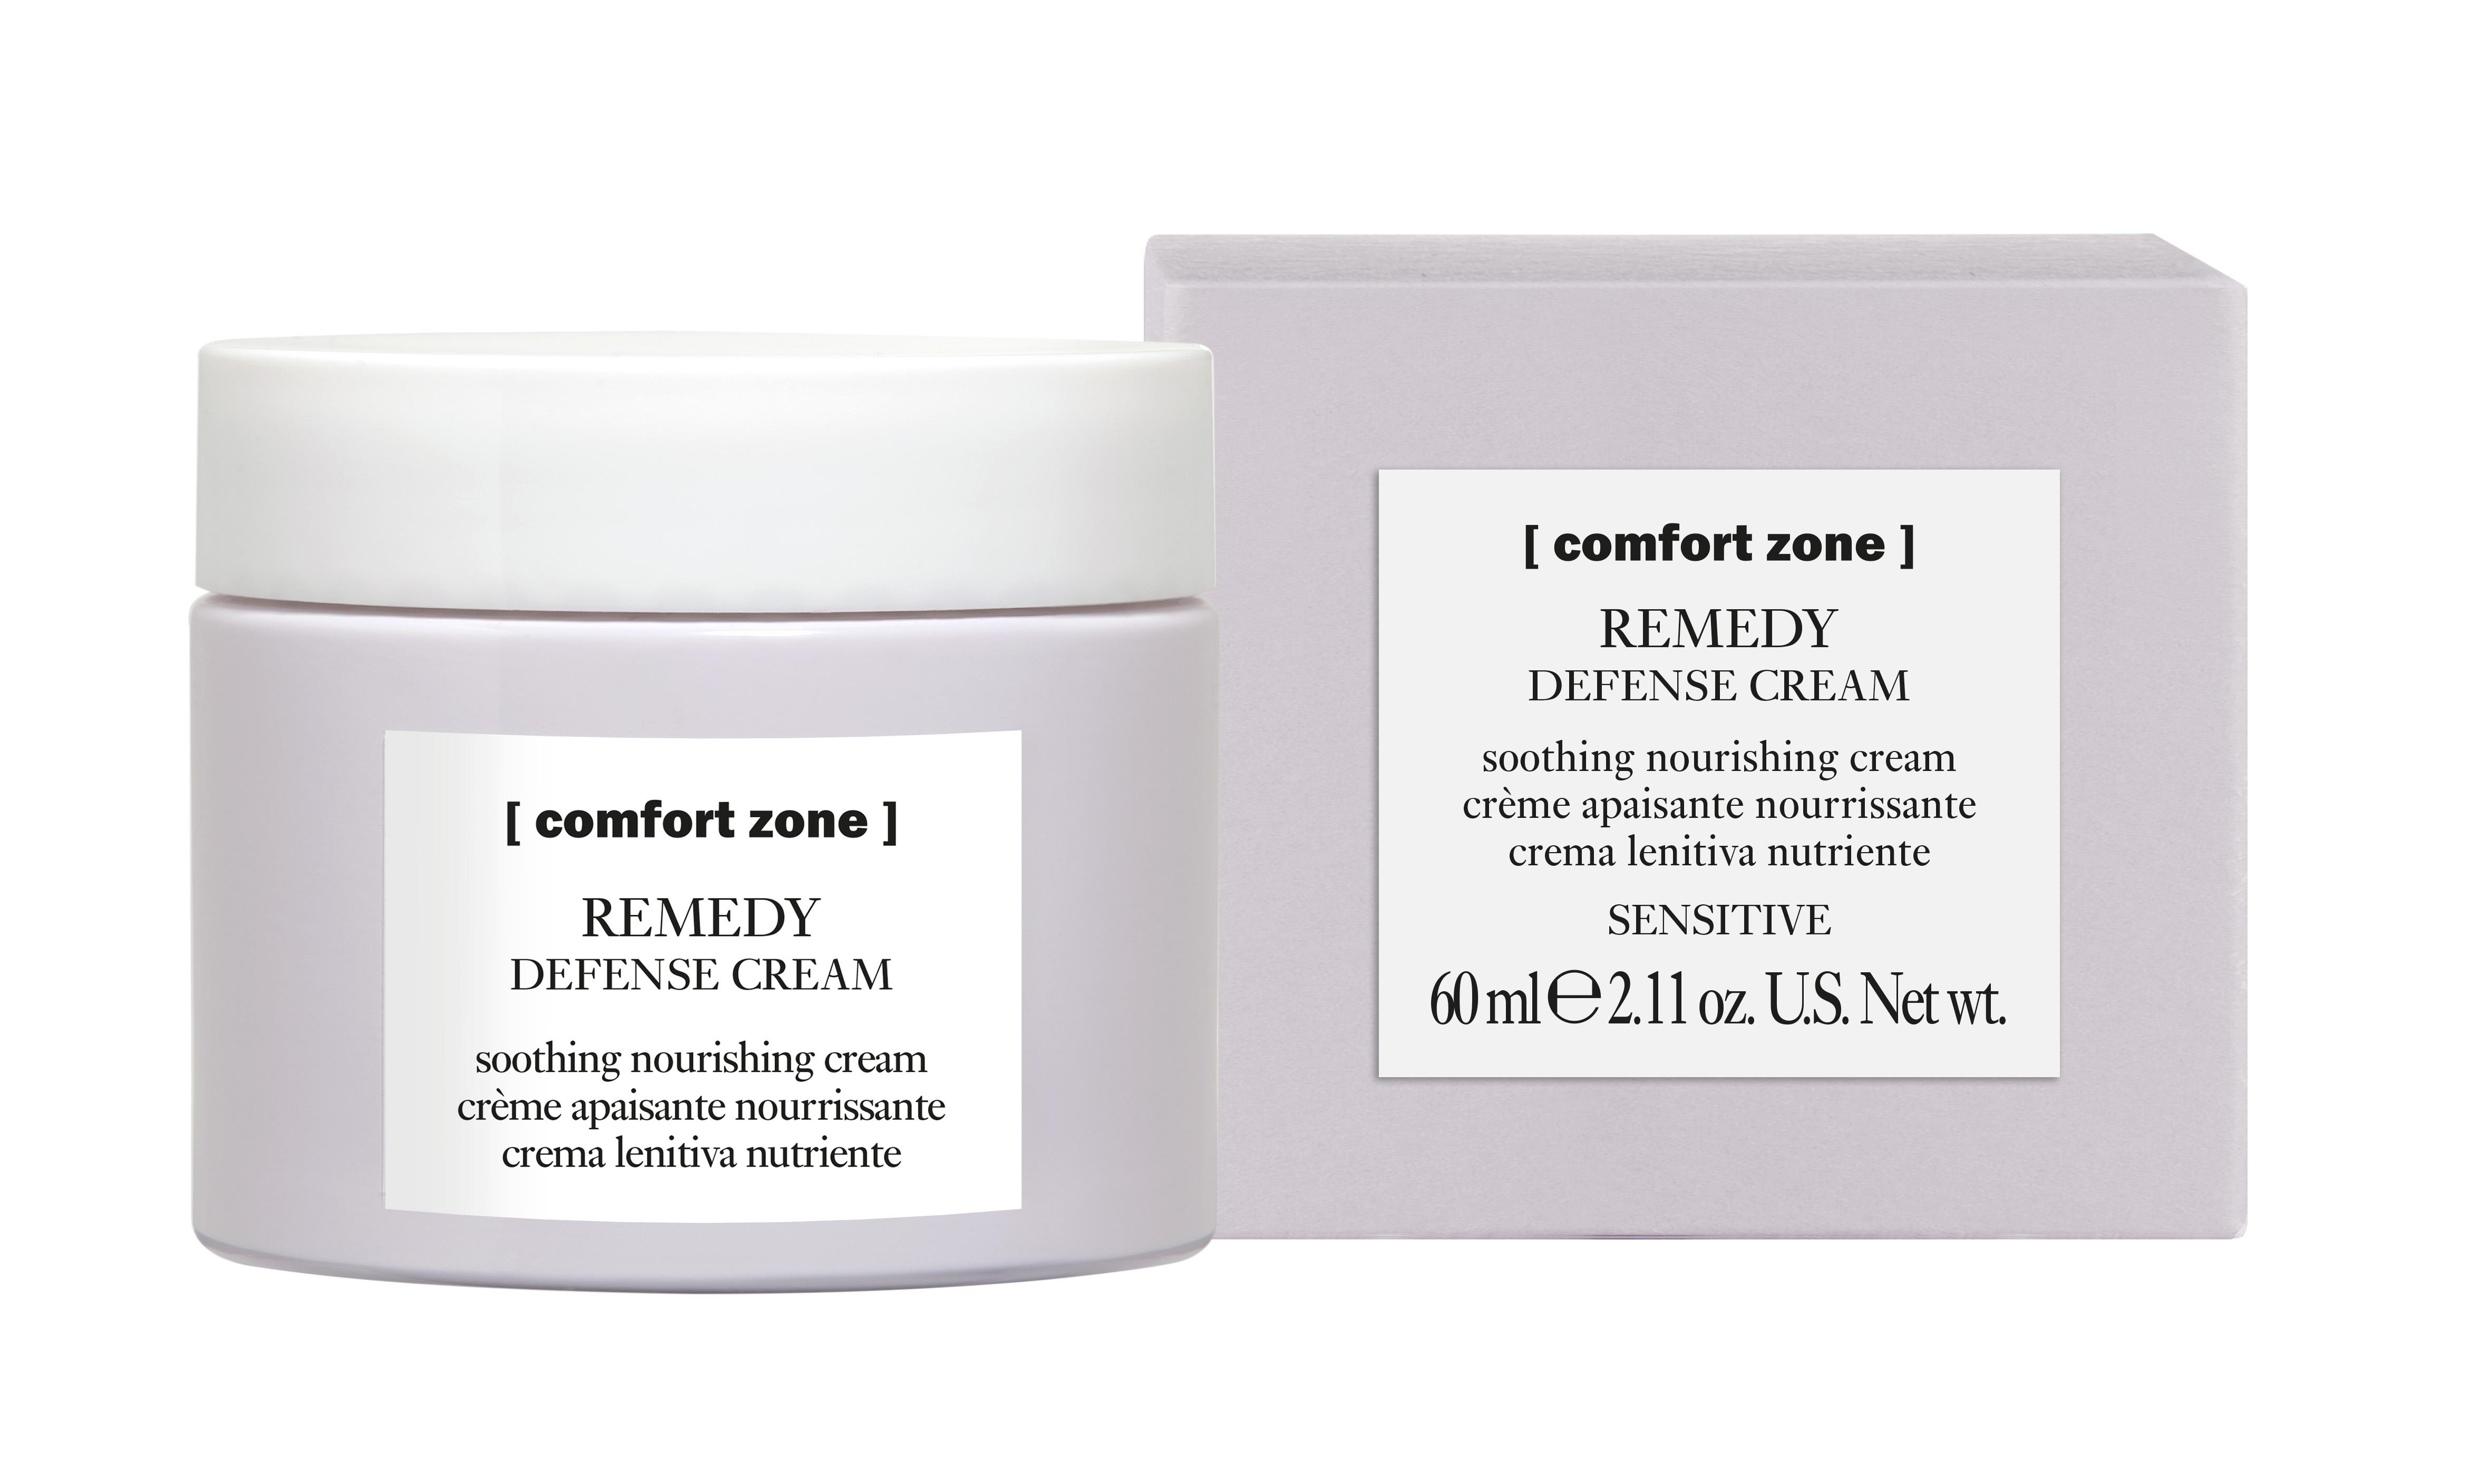 Comfort Zone Remedy Defense Cream, 60 ml